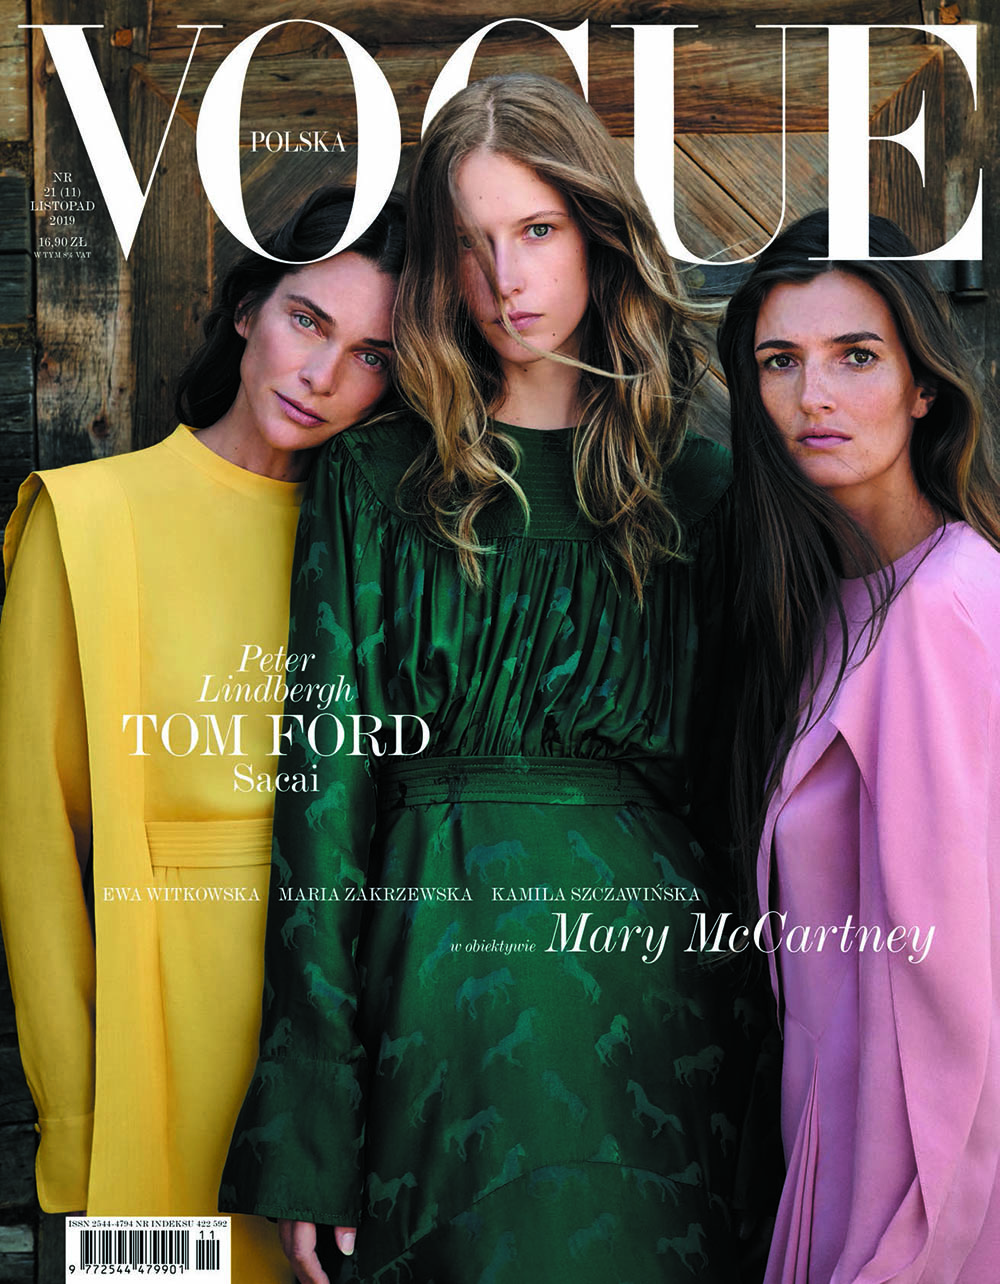 Vogue Poland November 2019 cover by Mary McCartney